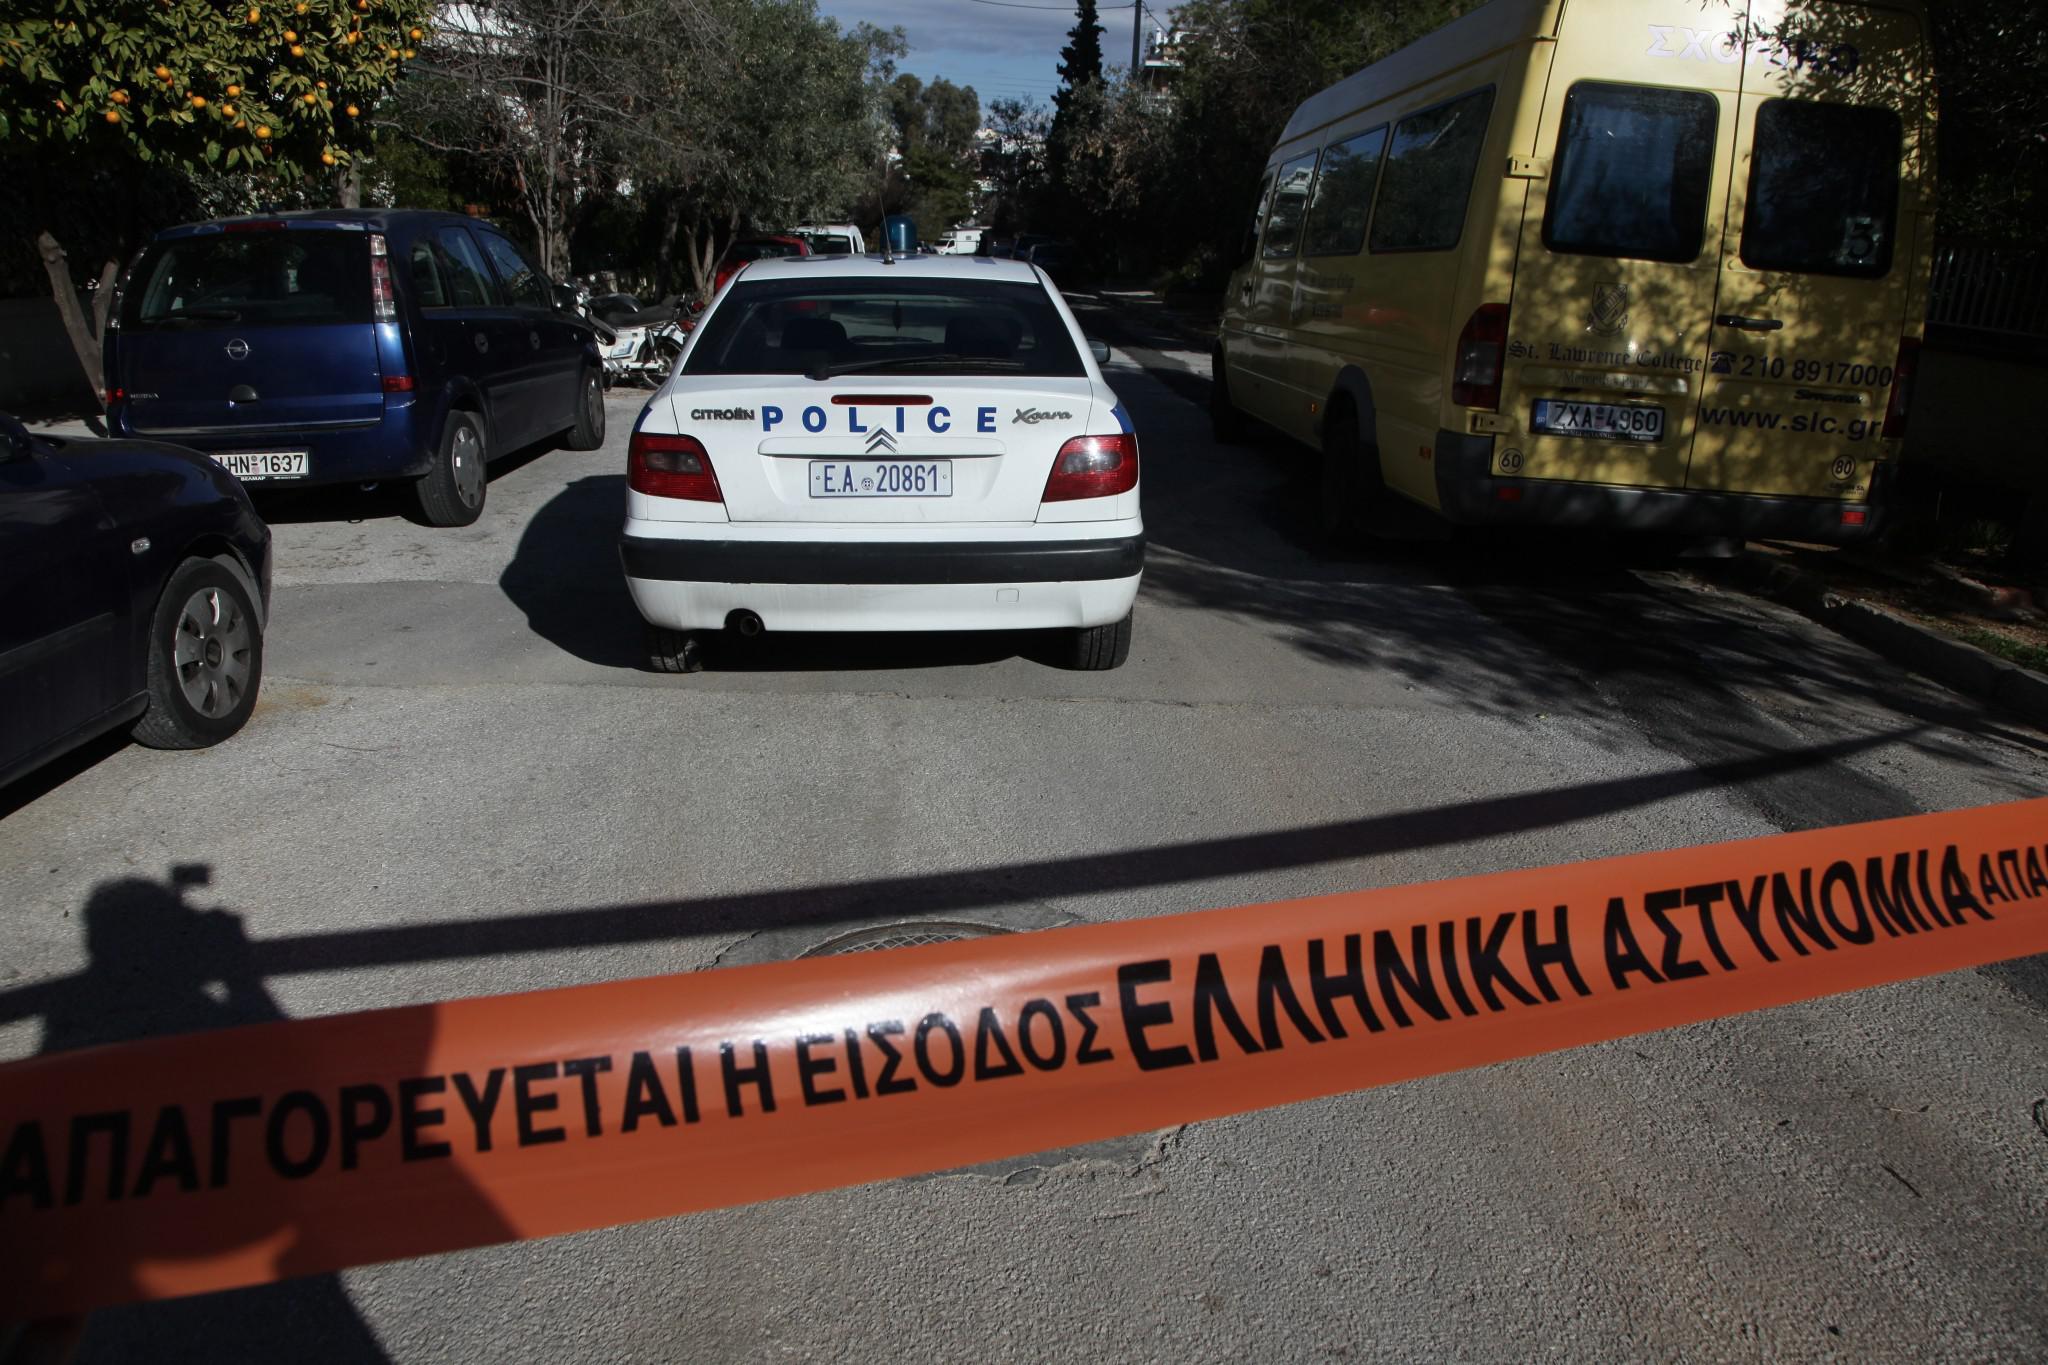 sullipsi-pola-roupa-antitromokratiki-maziotis-epanastatikos-agonas-8 Πώς έγινε η σύλληψη της συντρόφου του Νίκου Μαζιώτη, Πόλας Ρούπα –Τι είπε στους αστυνομικούς